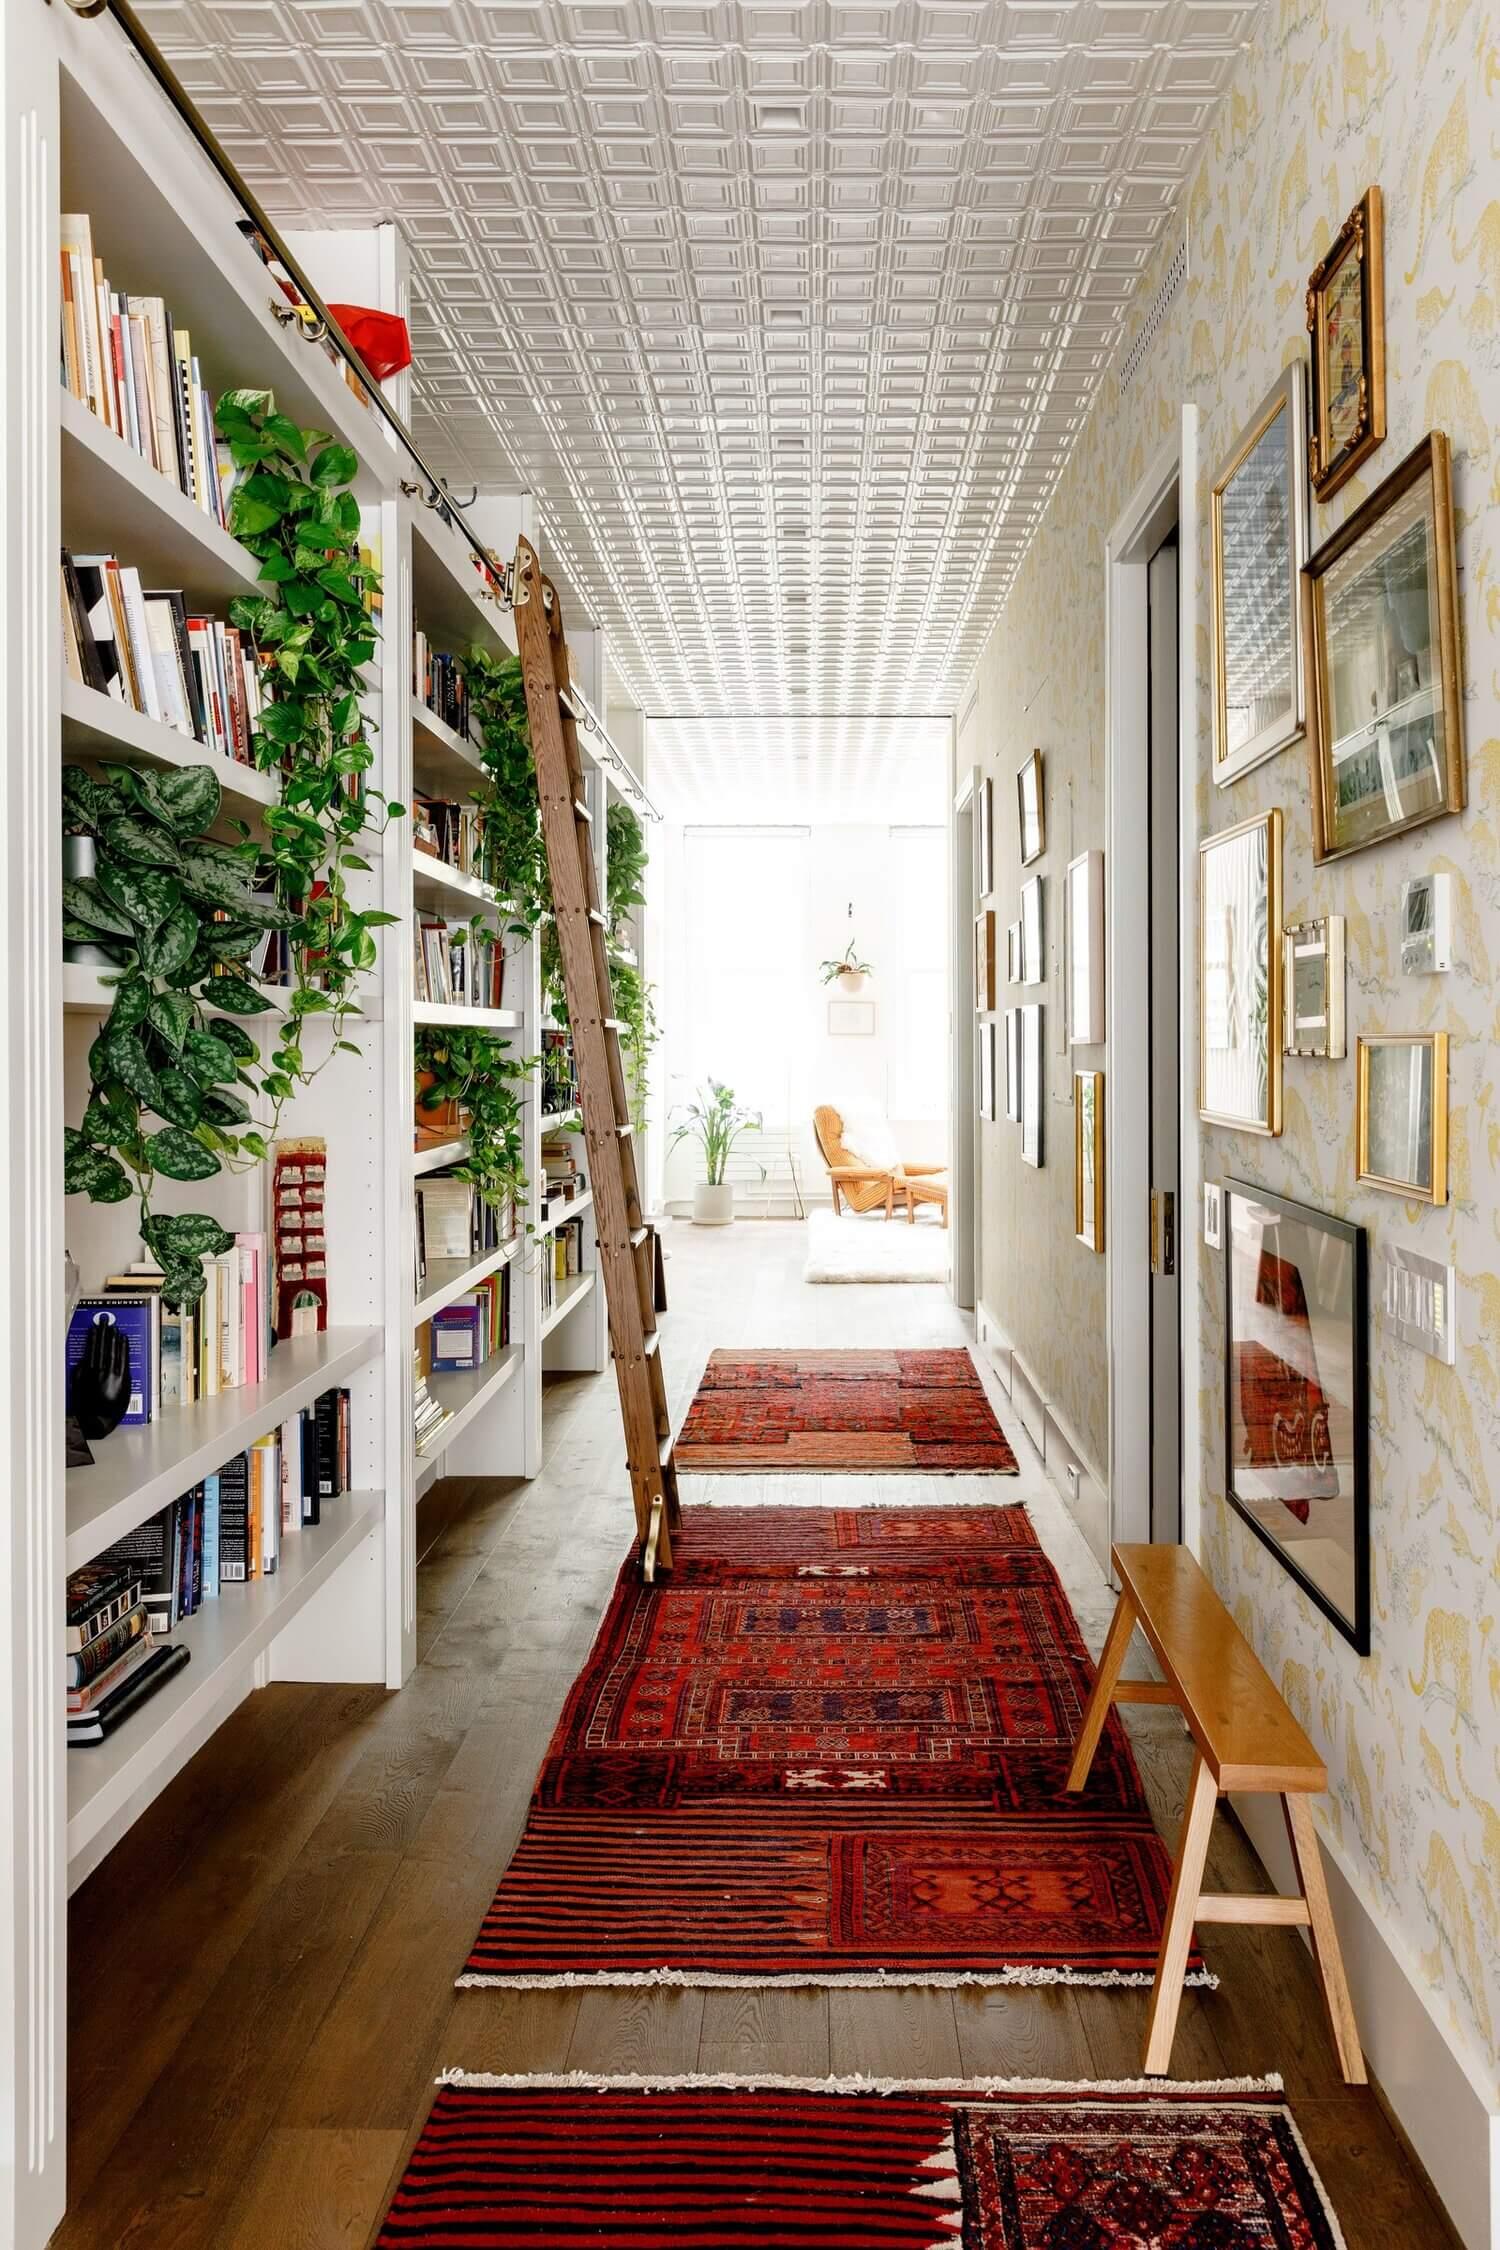 Actor David Harbour's New York Loft Apartment